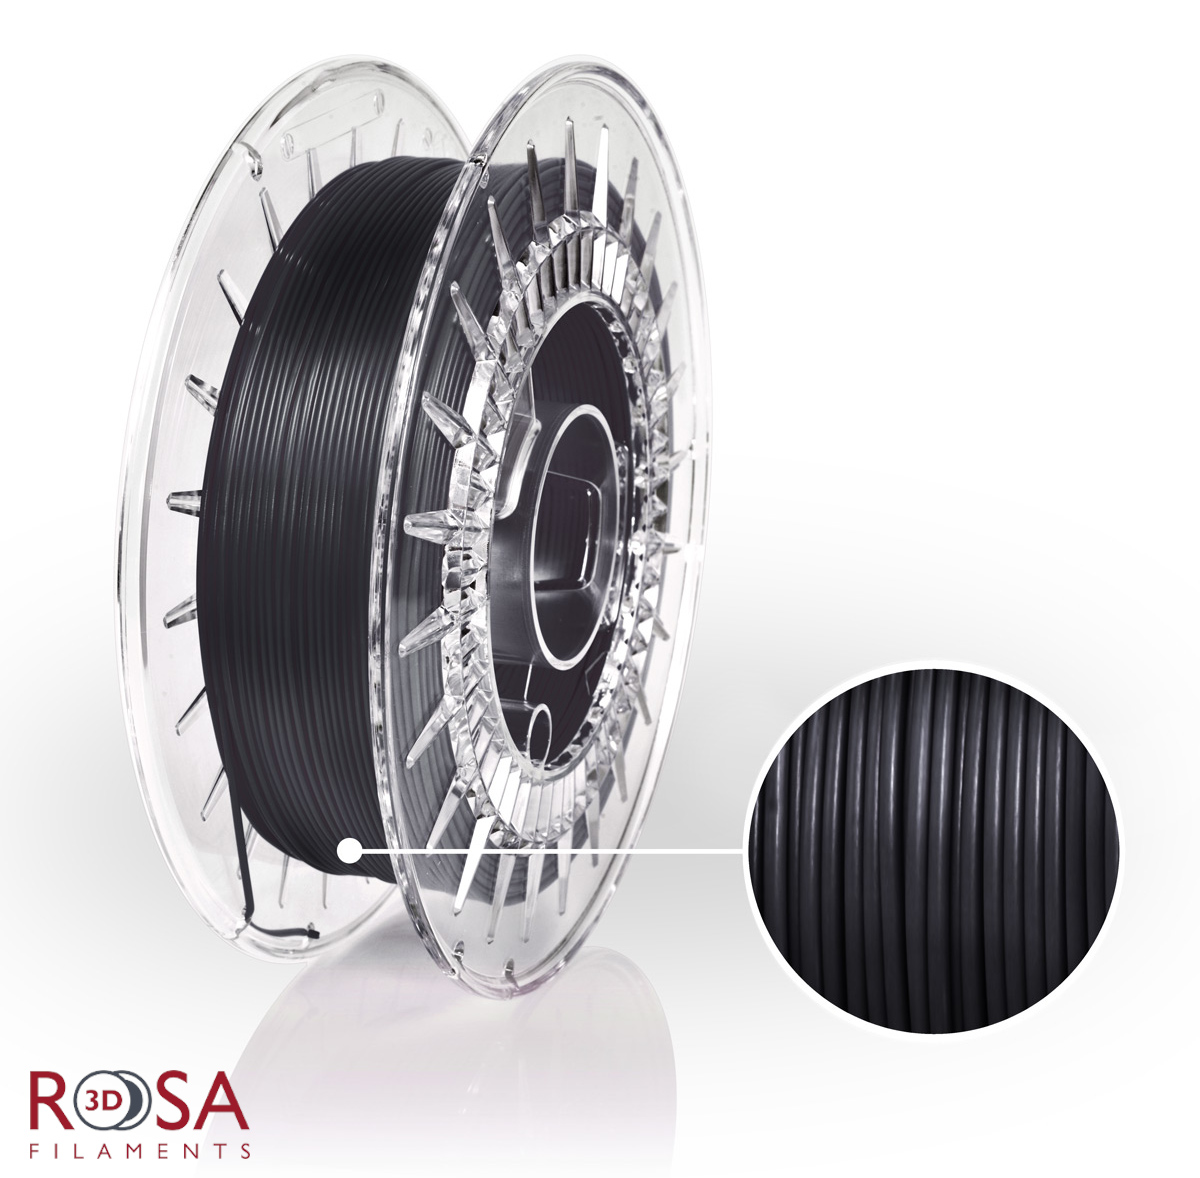 szpula filamentu ROSA-Flex 85A o wadze 0,5 kg produkcji ROSA3D